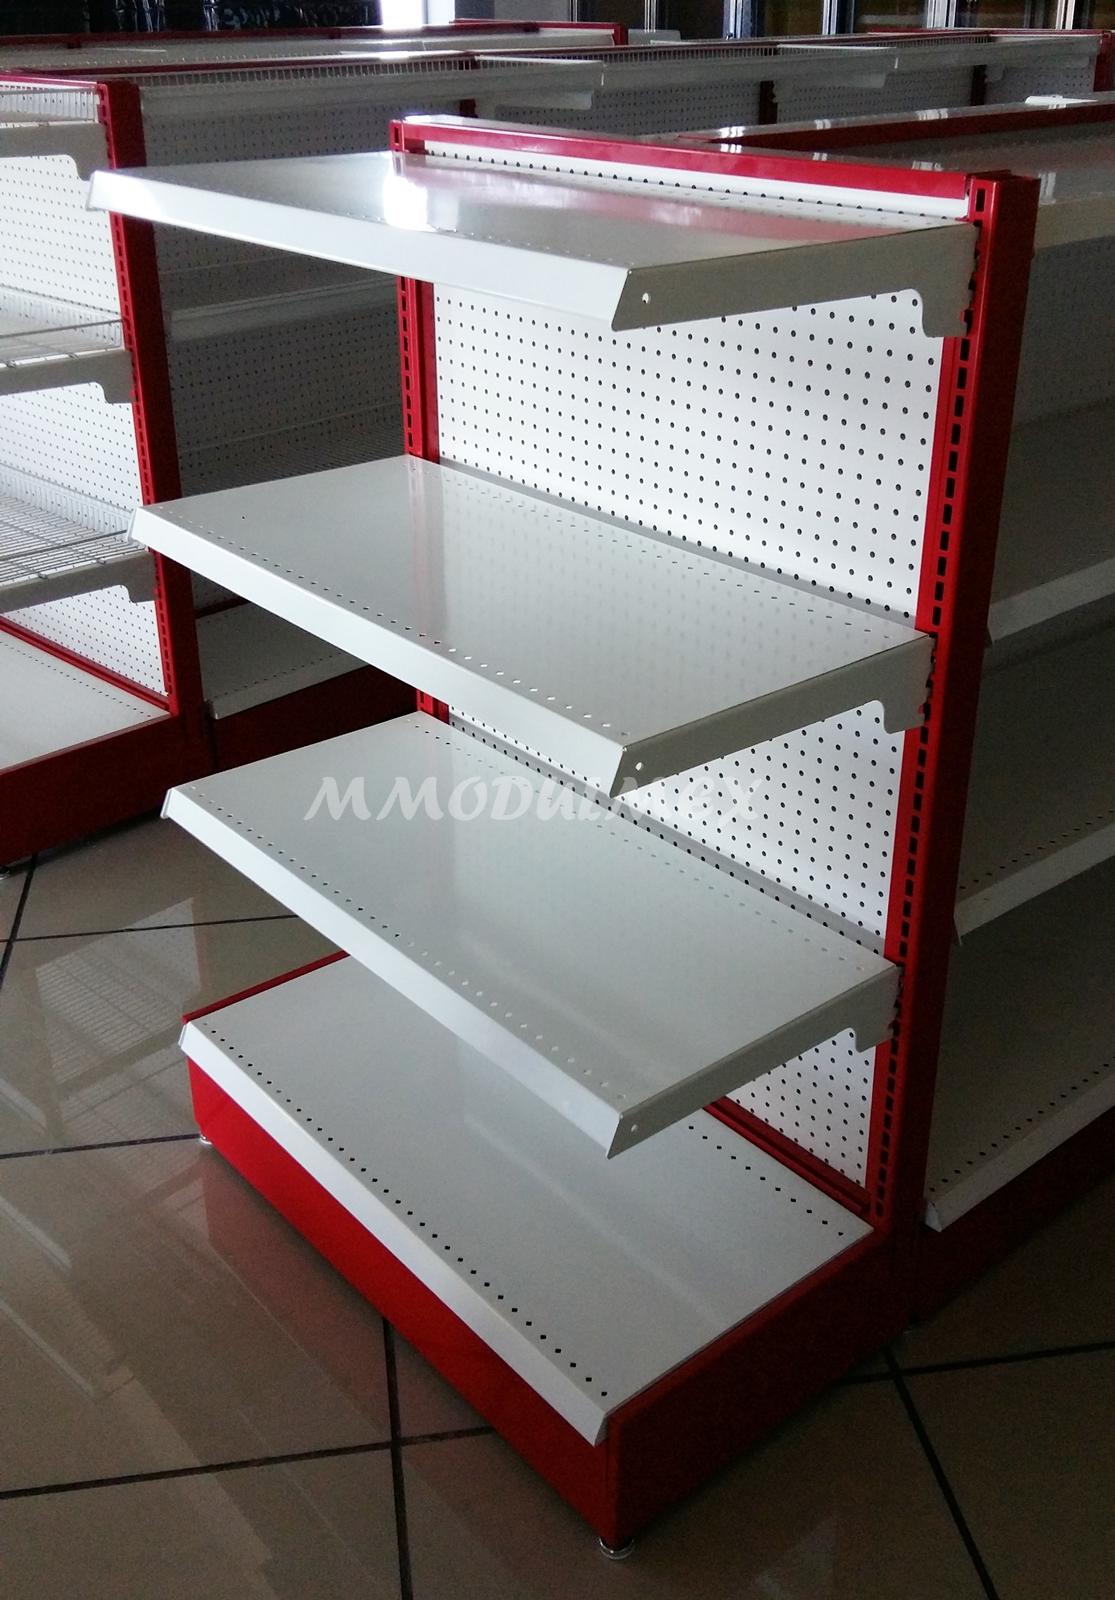 Estantes estanteria anaqueles repisas entrepa os for La gondola muebles